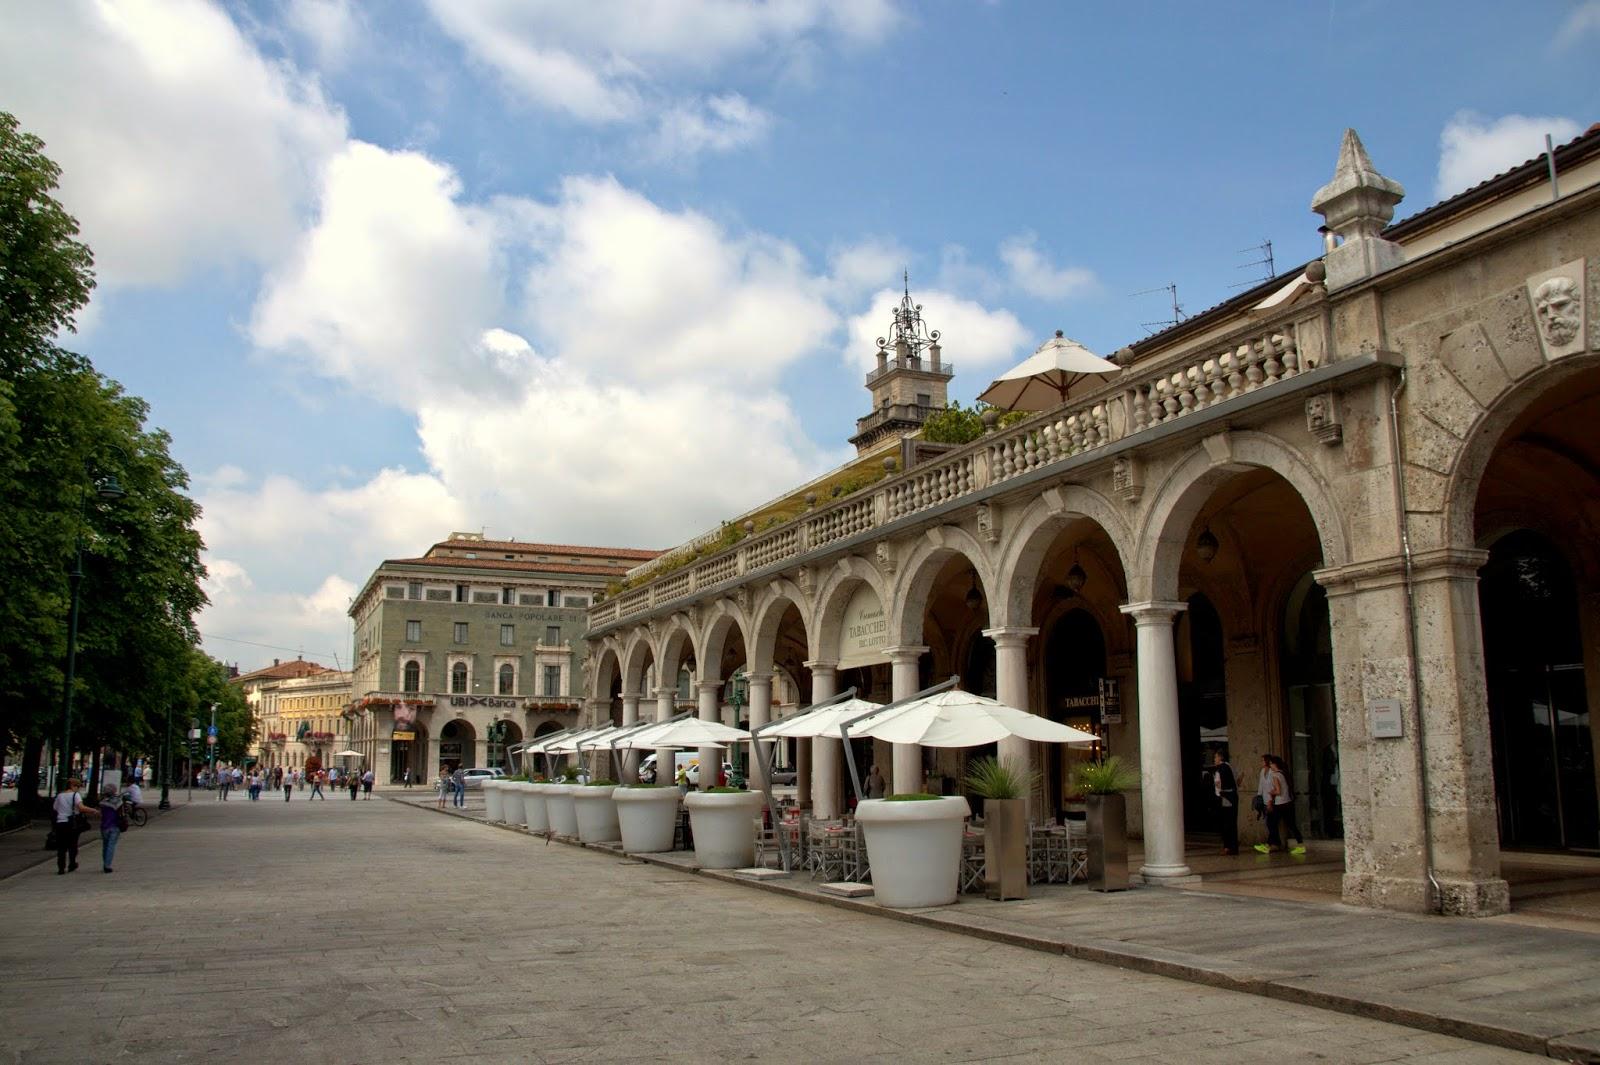 Urokliwe zaułki Bergamo, dolne miasto